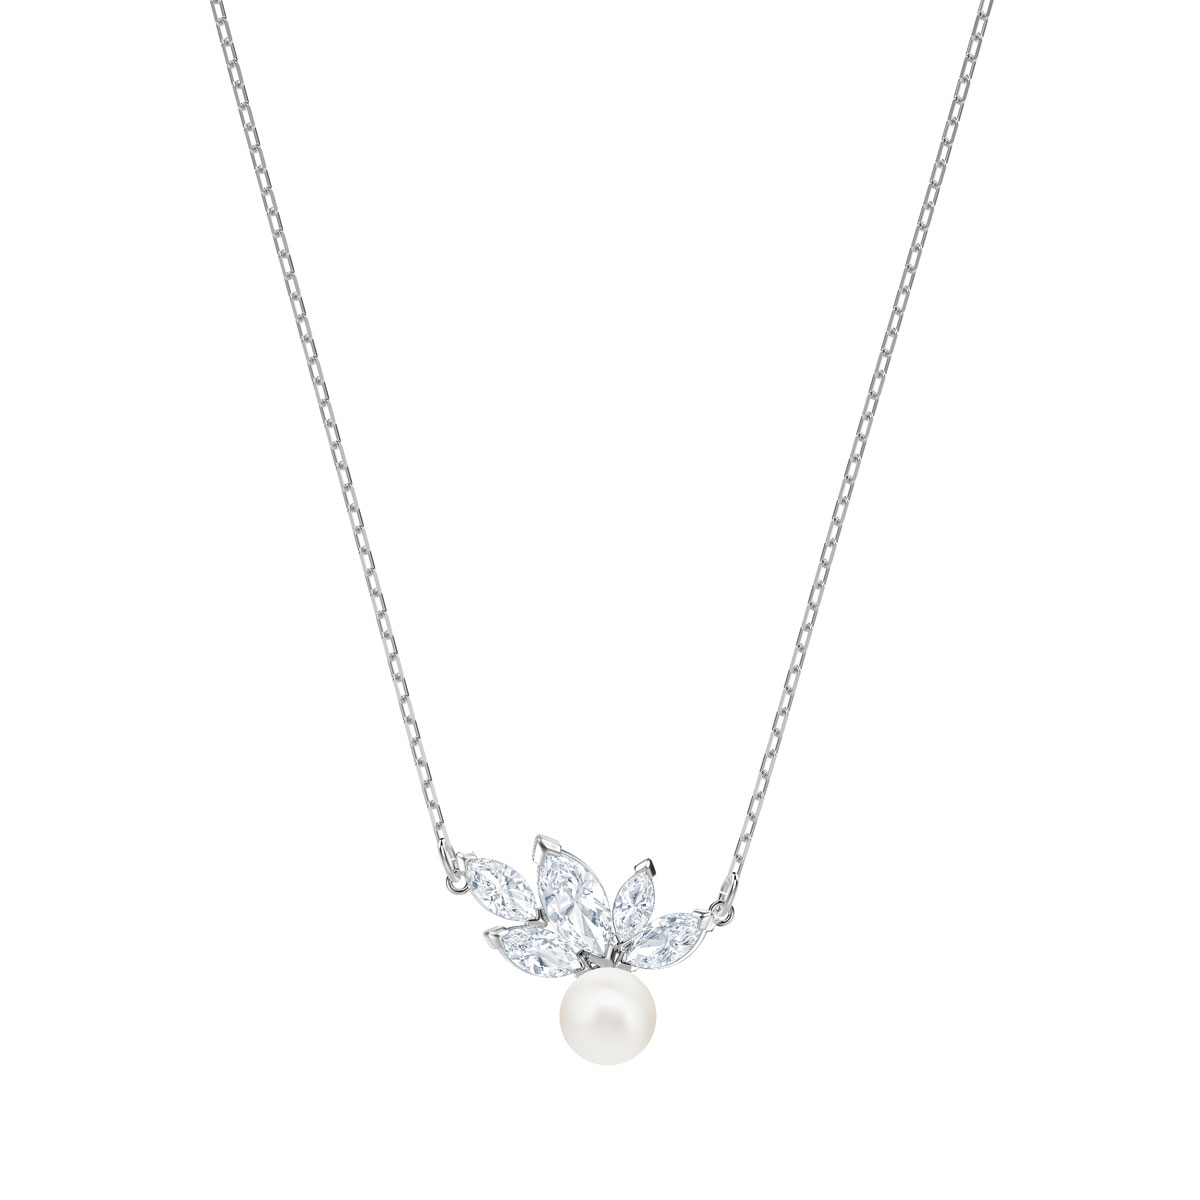 Swarovski Louison Pearl, Crystal and Rhodium Pendant Necklace